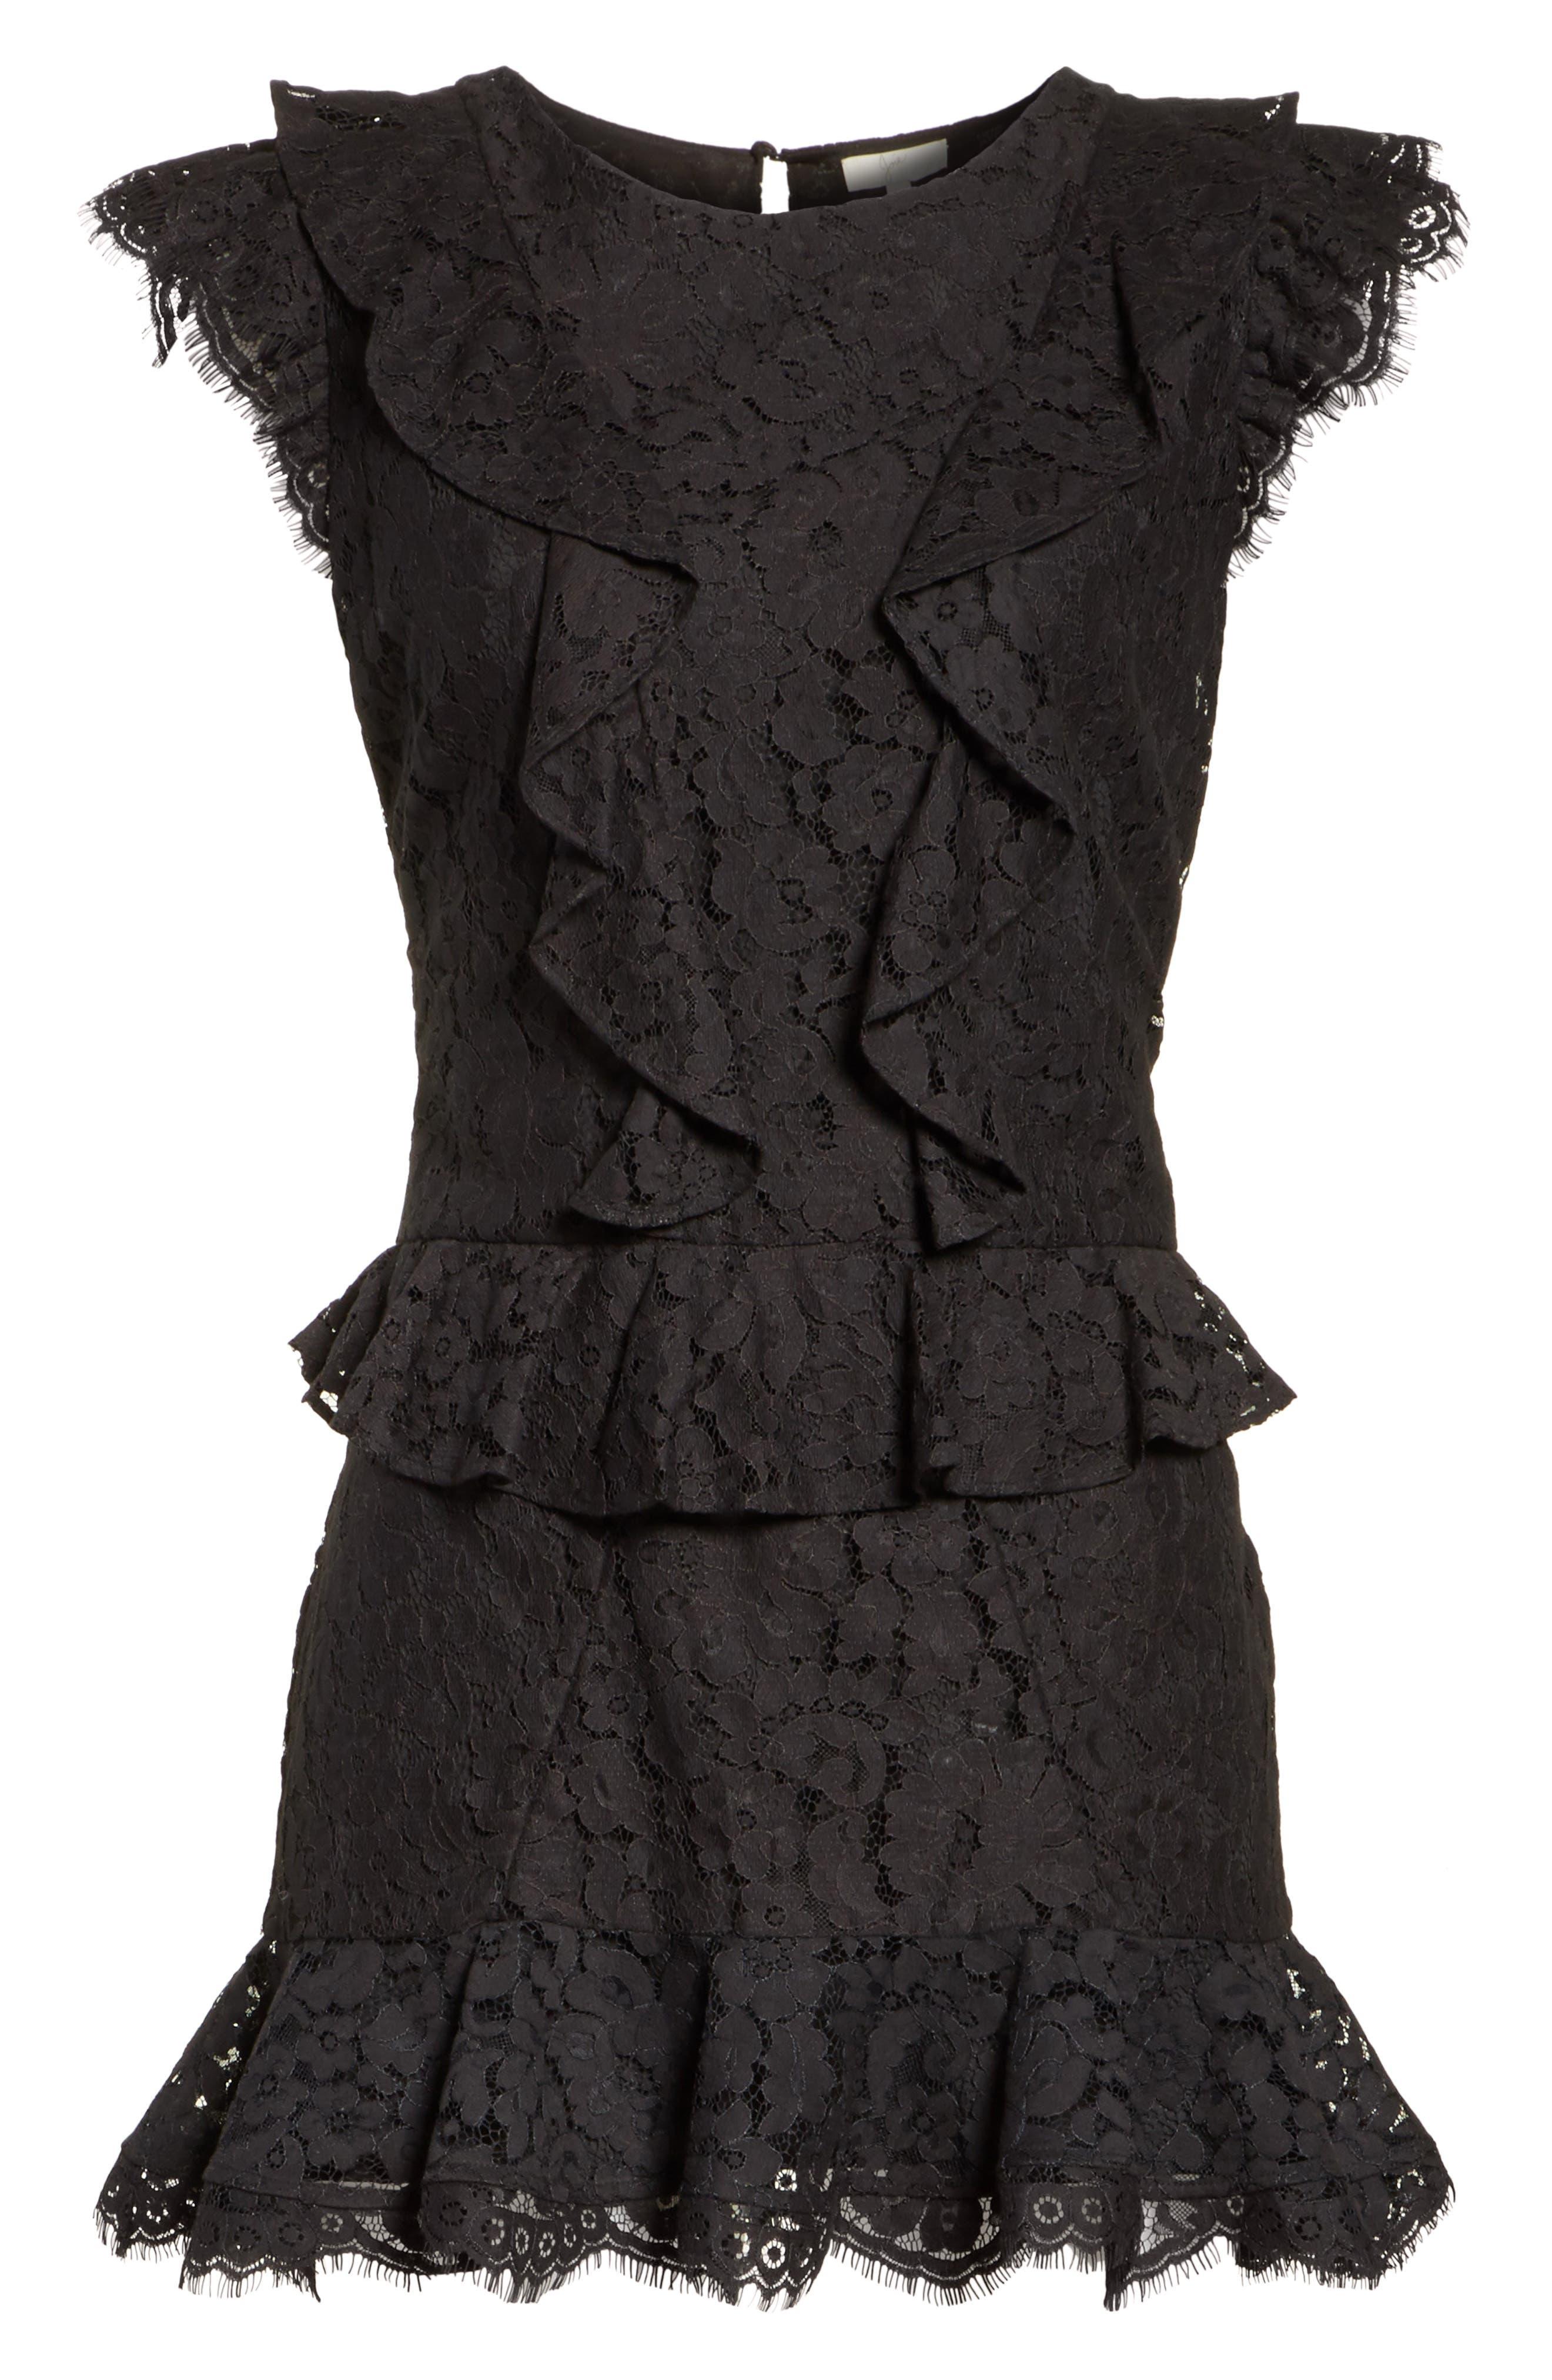 Acostas Ruffle & Lace Dress,                             Alternate thumbnail 6, color,                             Caviar